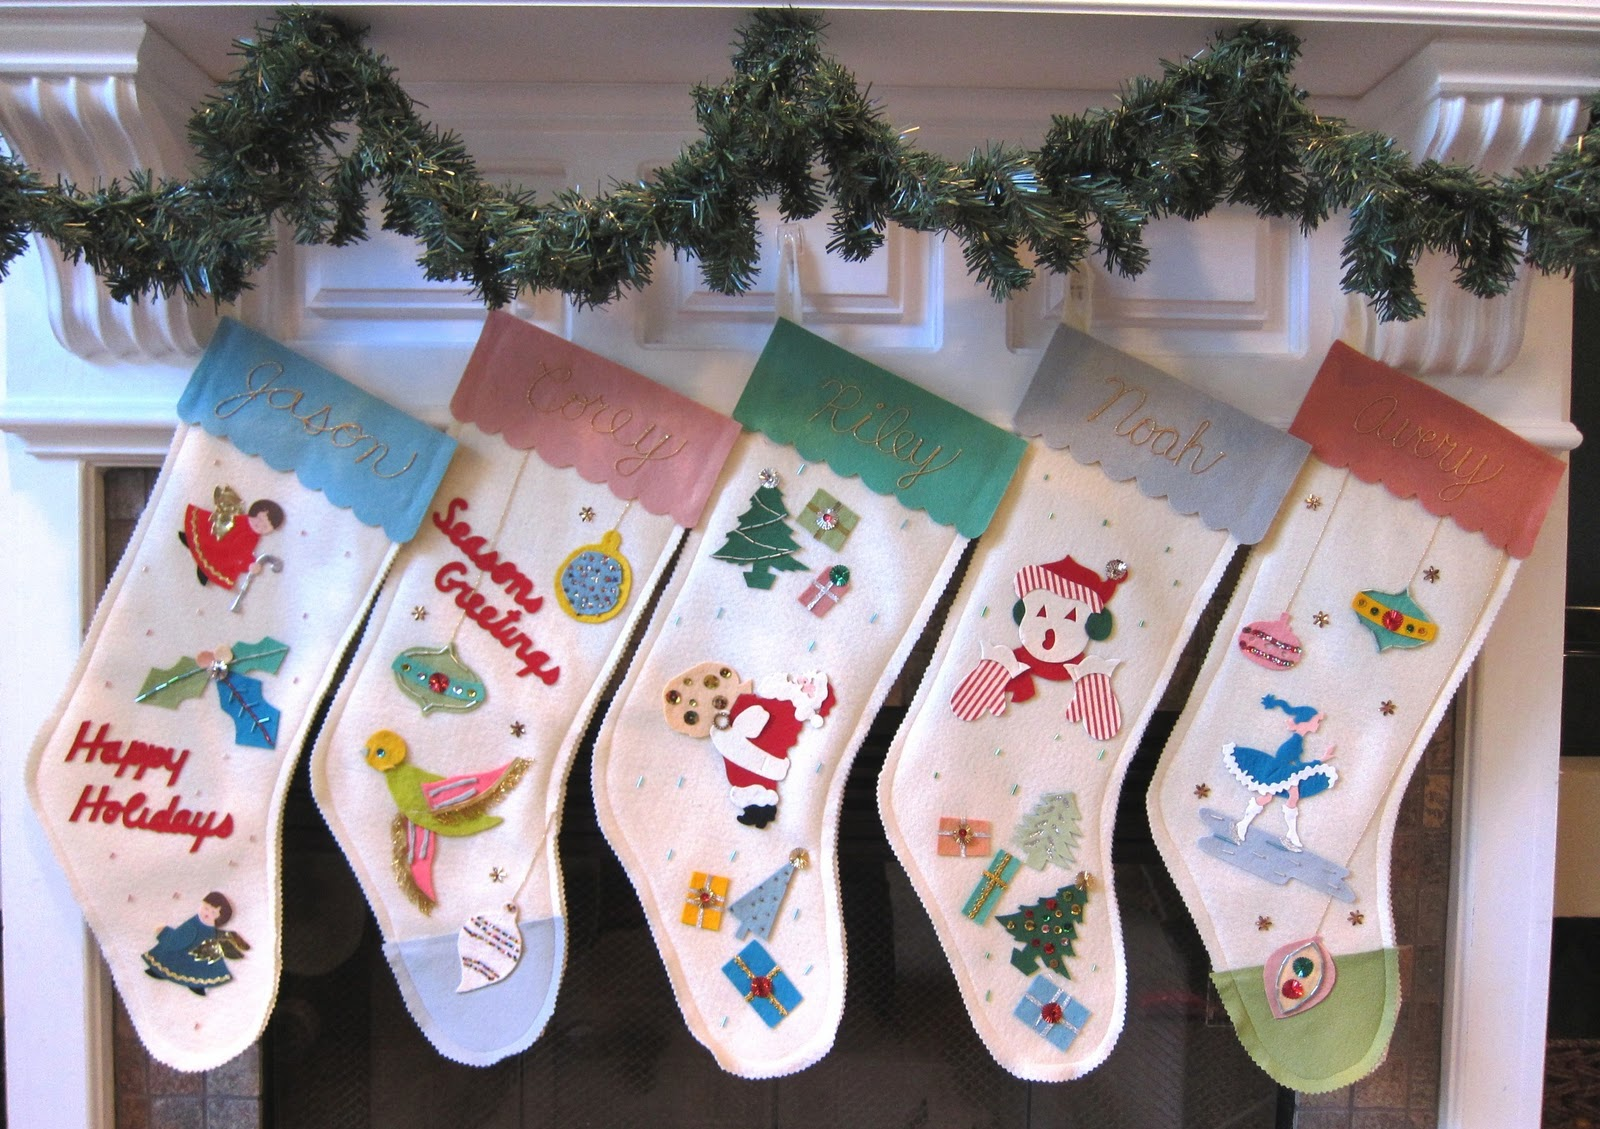 Vintage Christmas Stockings.Corey Moortgat Collage Artist Vintage Christmas Stockings